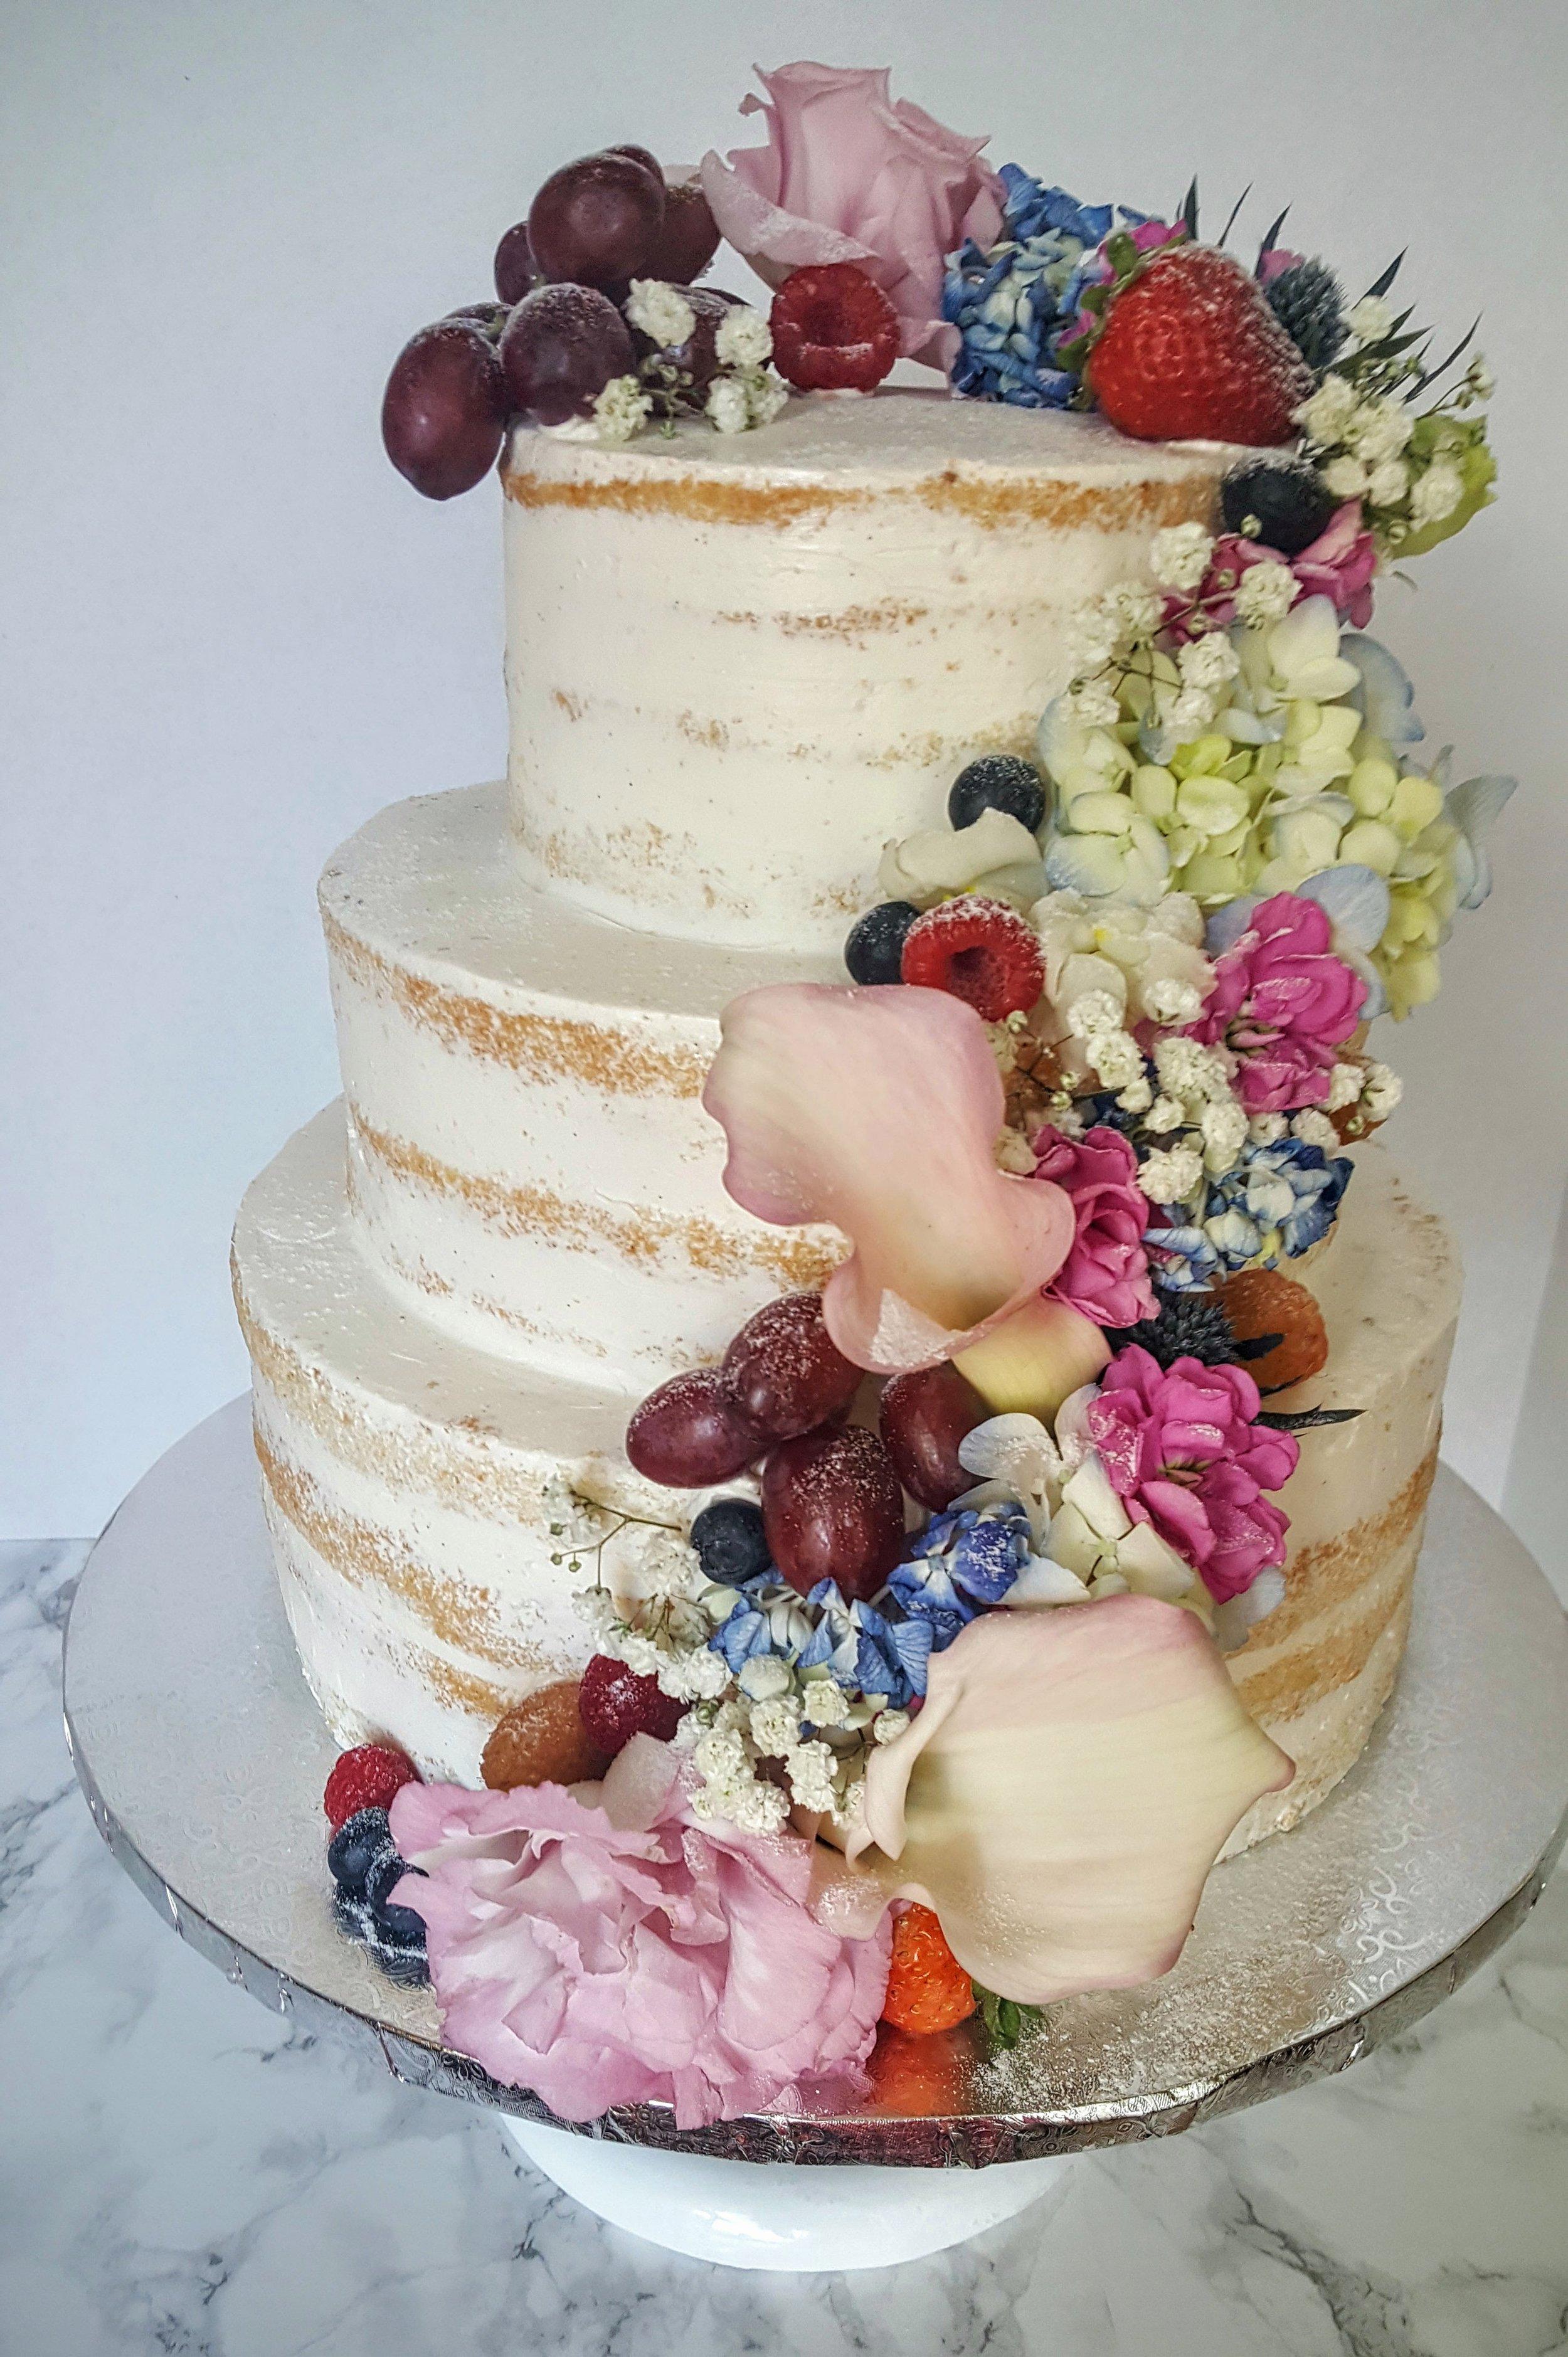 Austin's and Maria's wedding cake